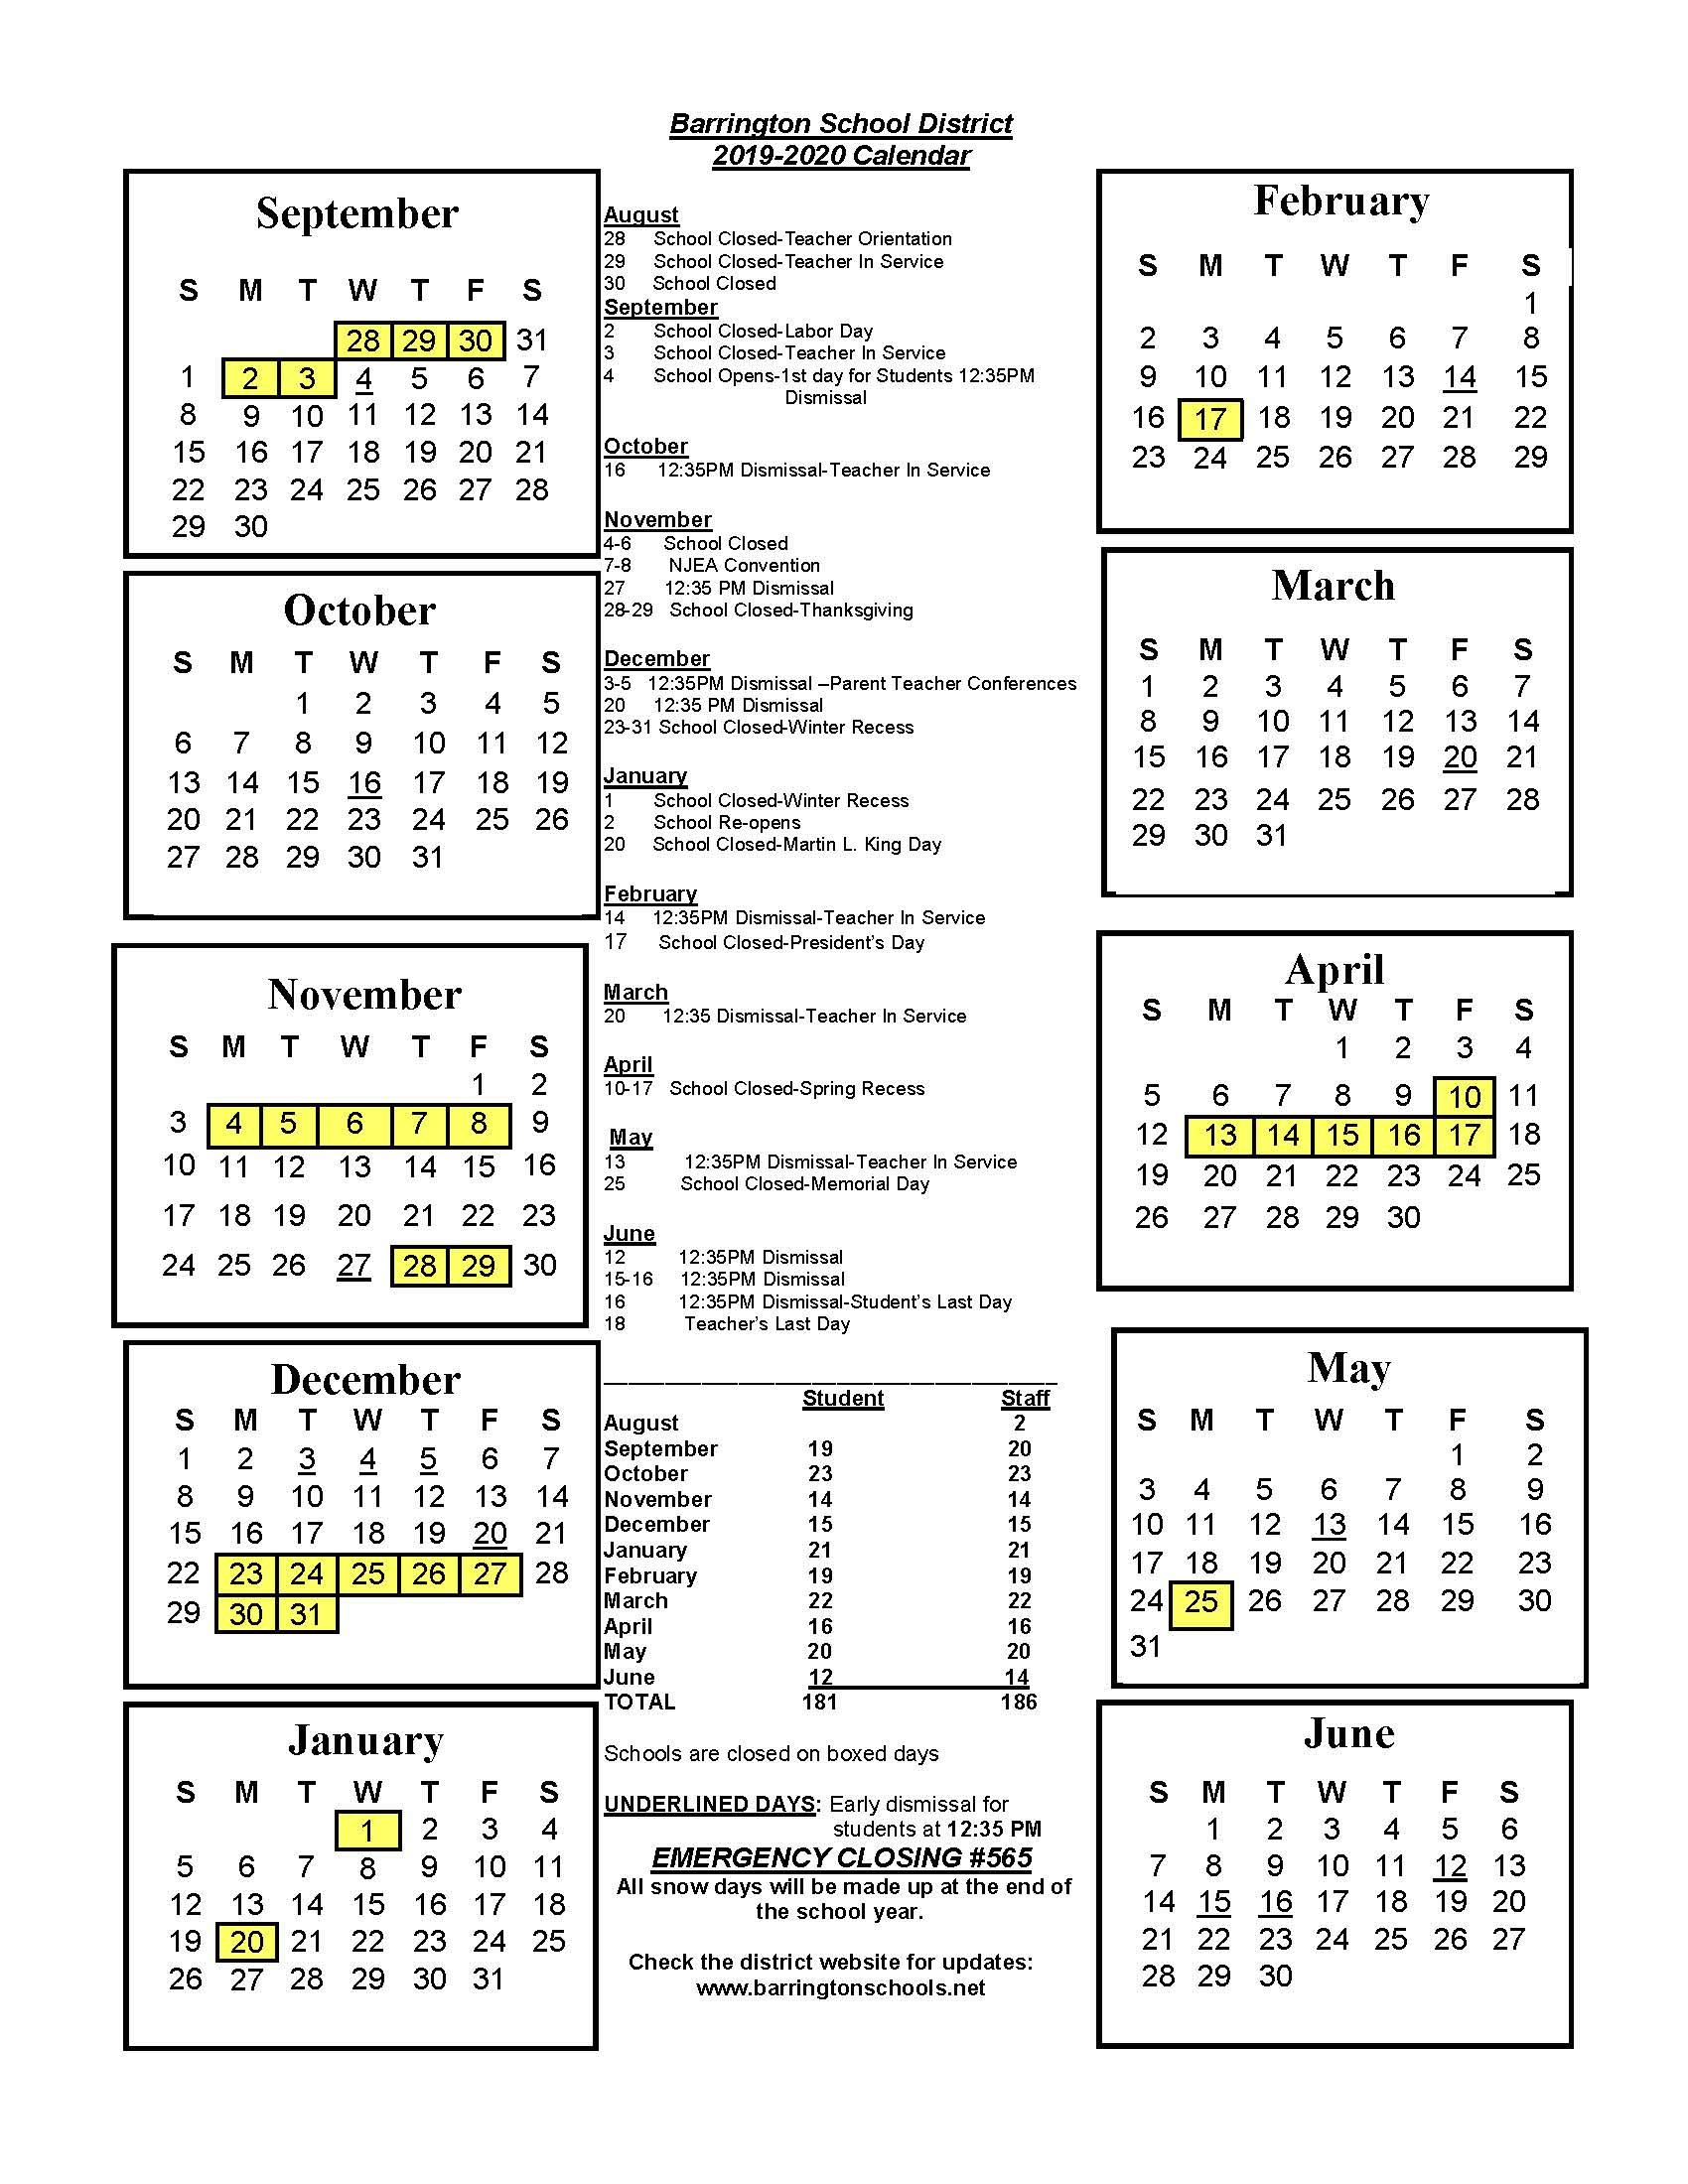 District Calendar - Barrington School District Intended For Boyertown School Calendar